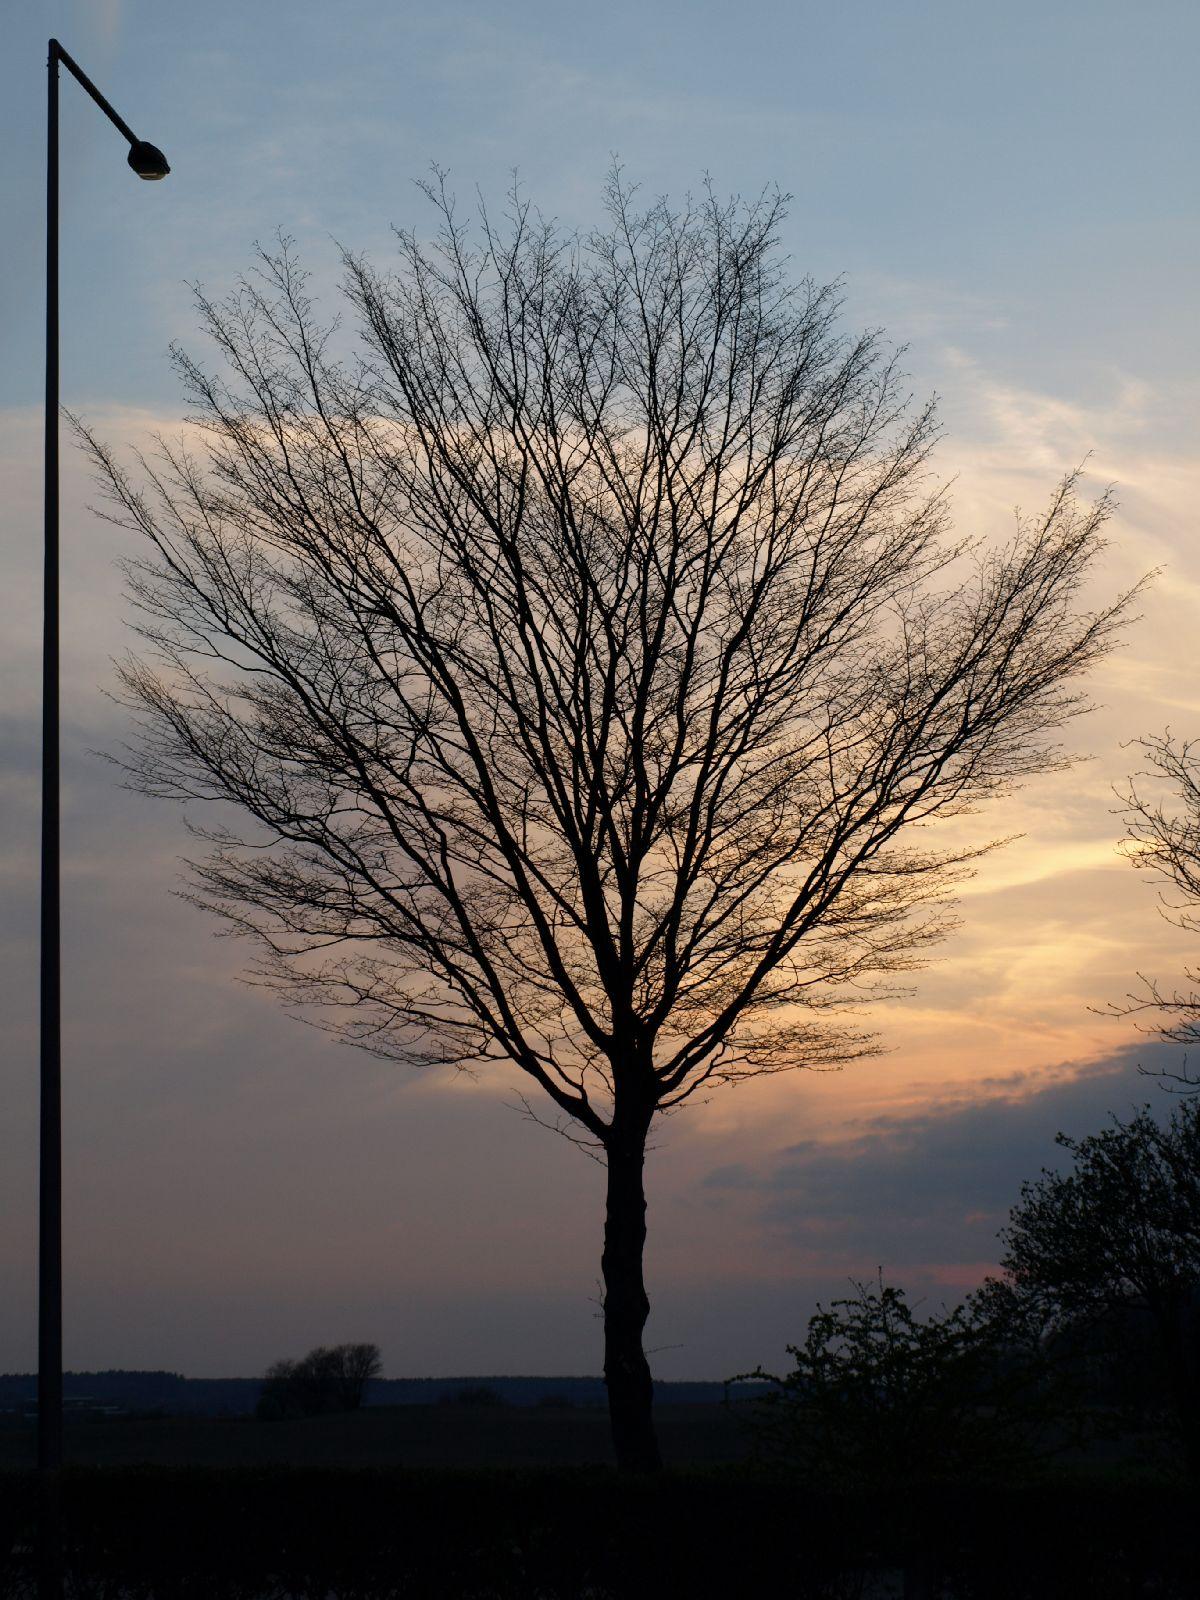 Pflanzen-Baum-Silhouette-Foto_Textur_B_P4171365